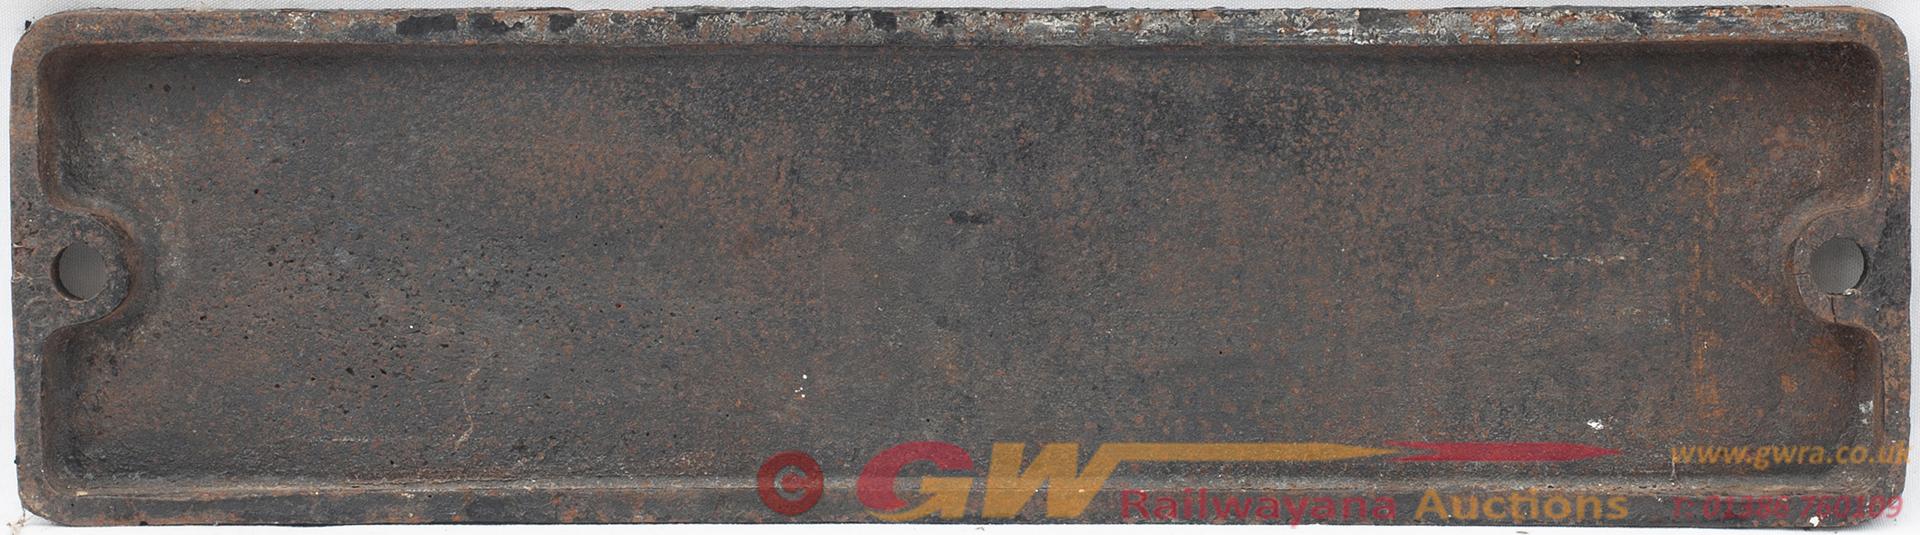 Smokebox Numberplate 44540 Ex LMS Fowler 4f 0-6-0